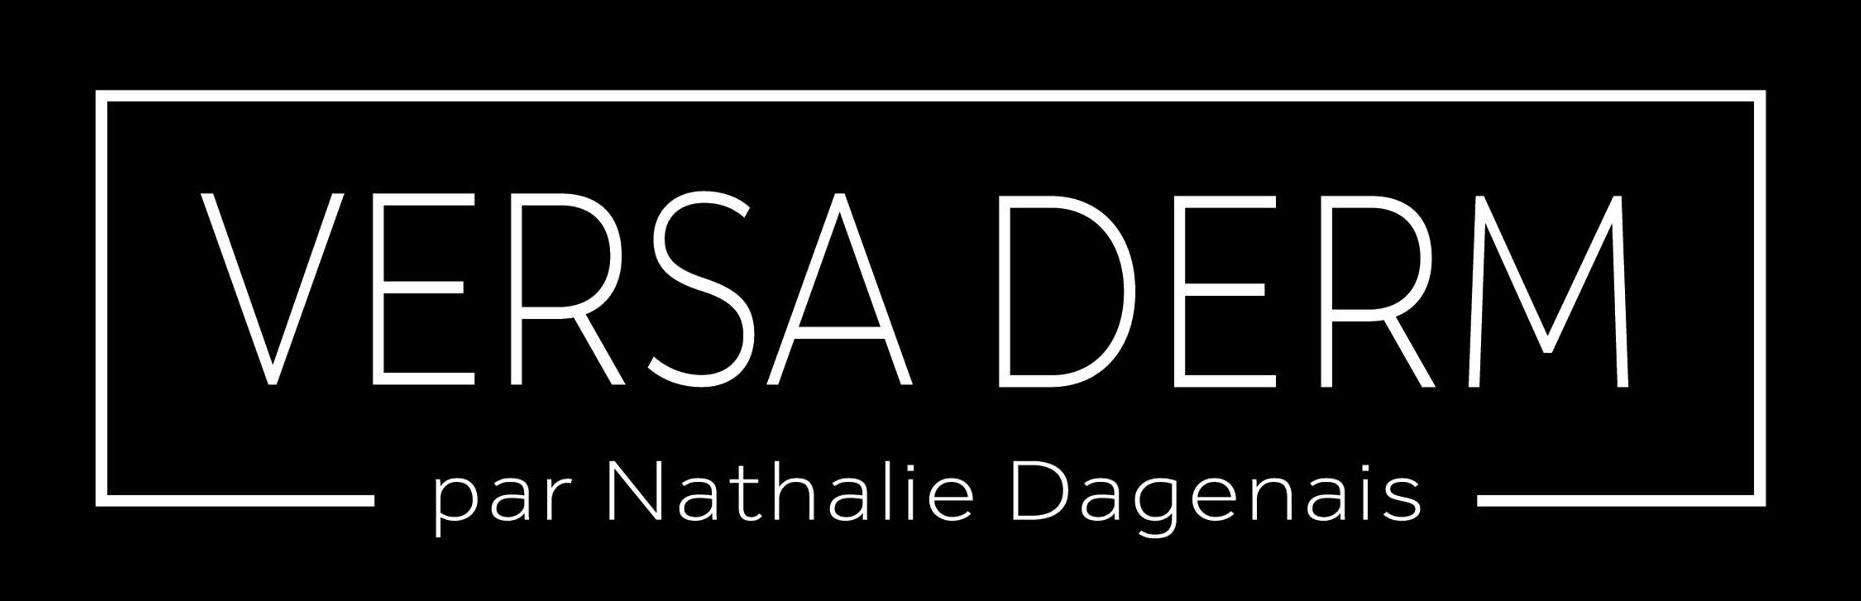 Versa Derm par Nathalie Dagenais